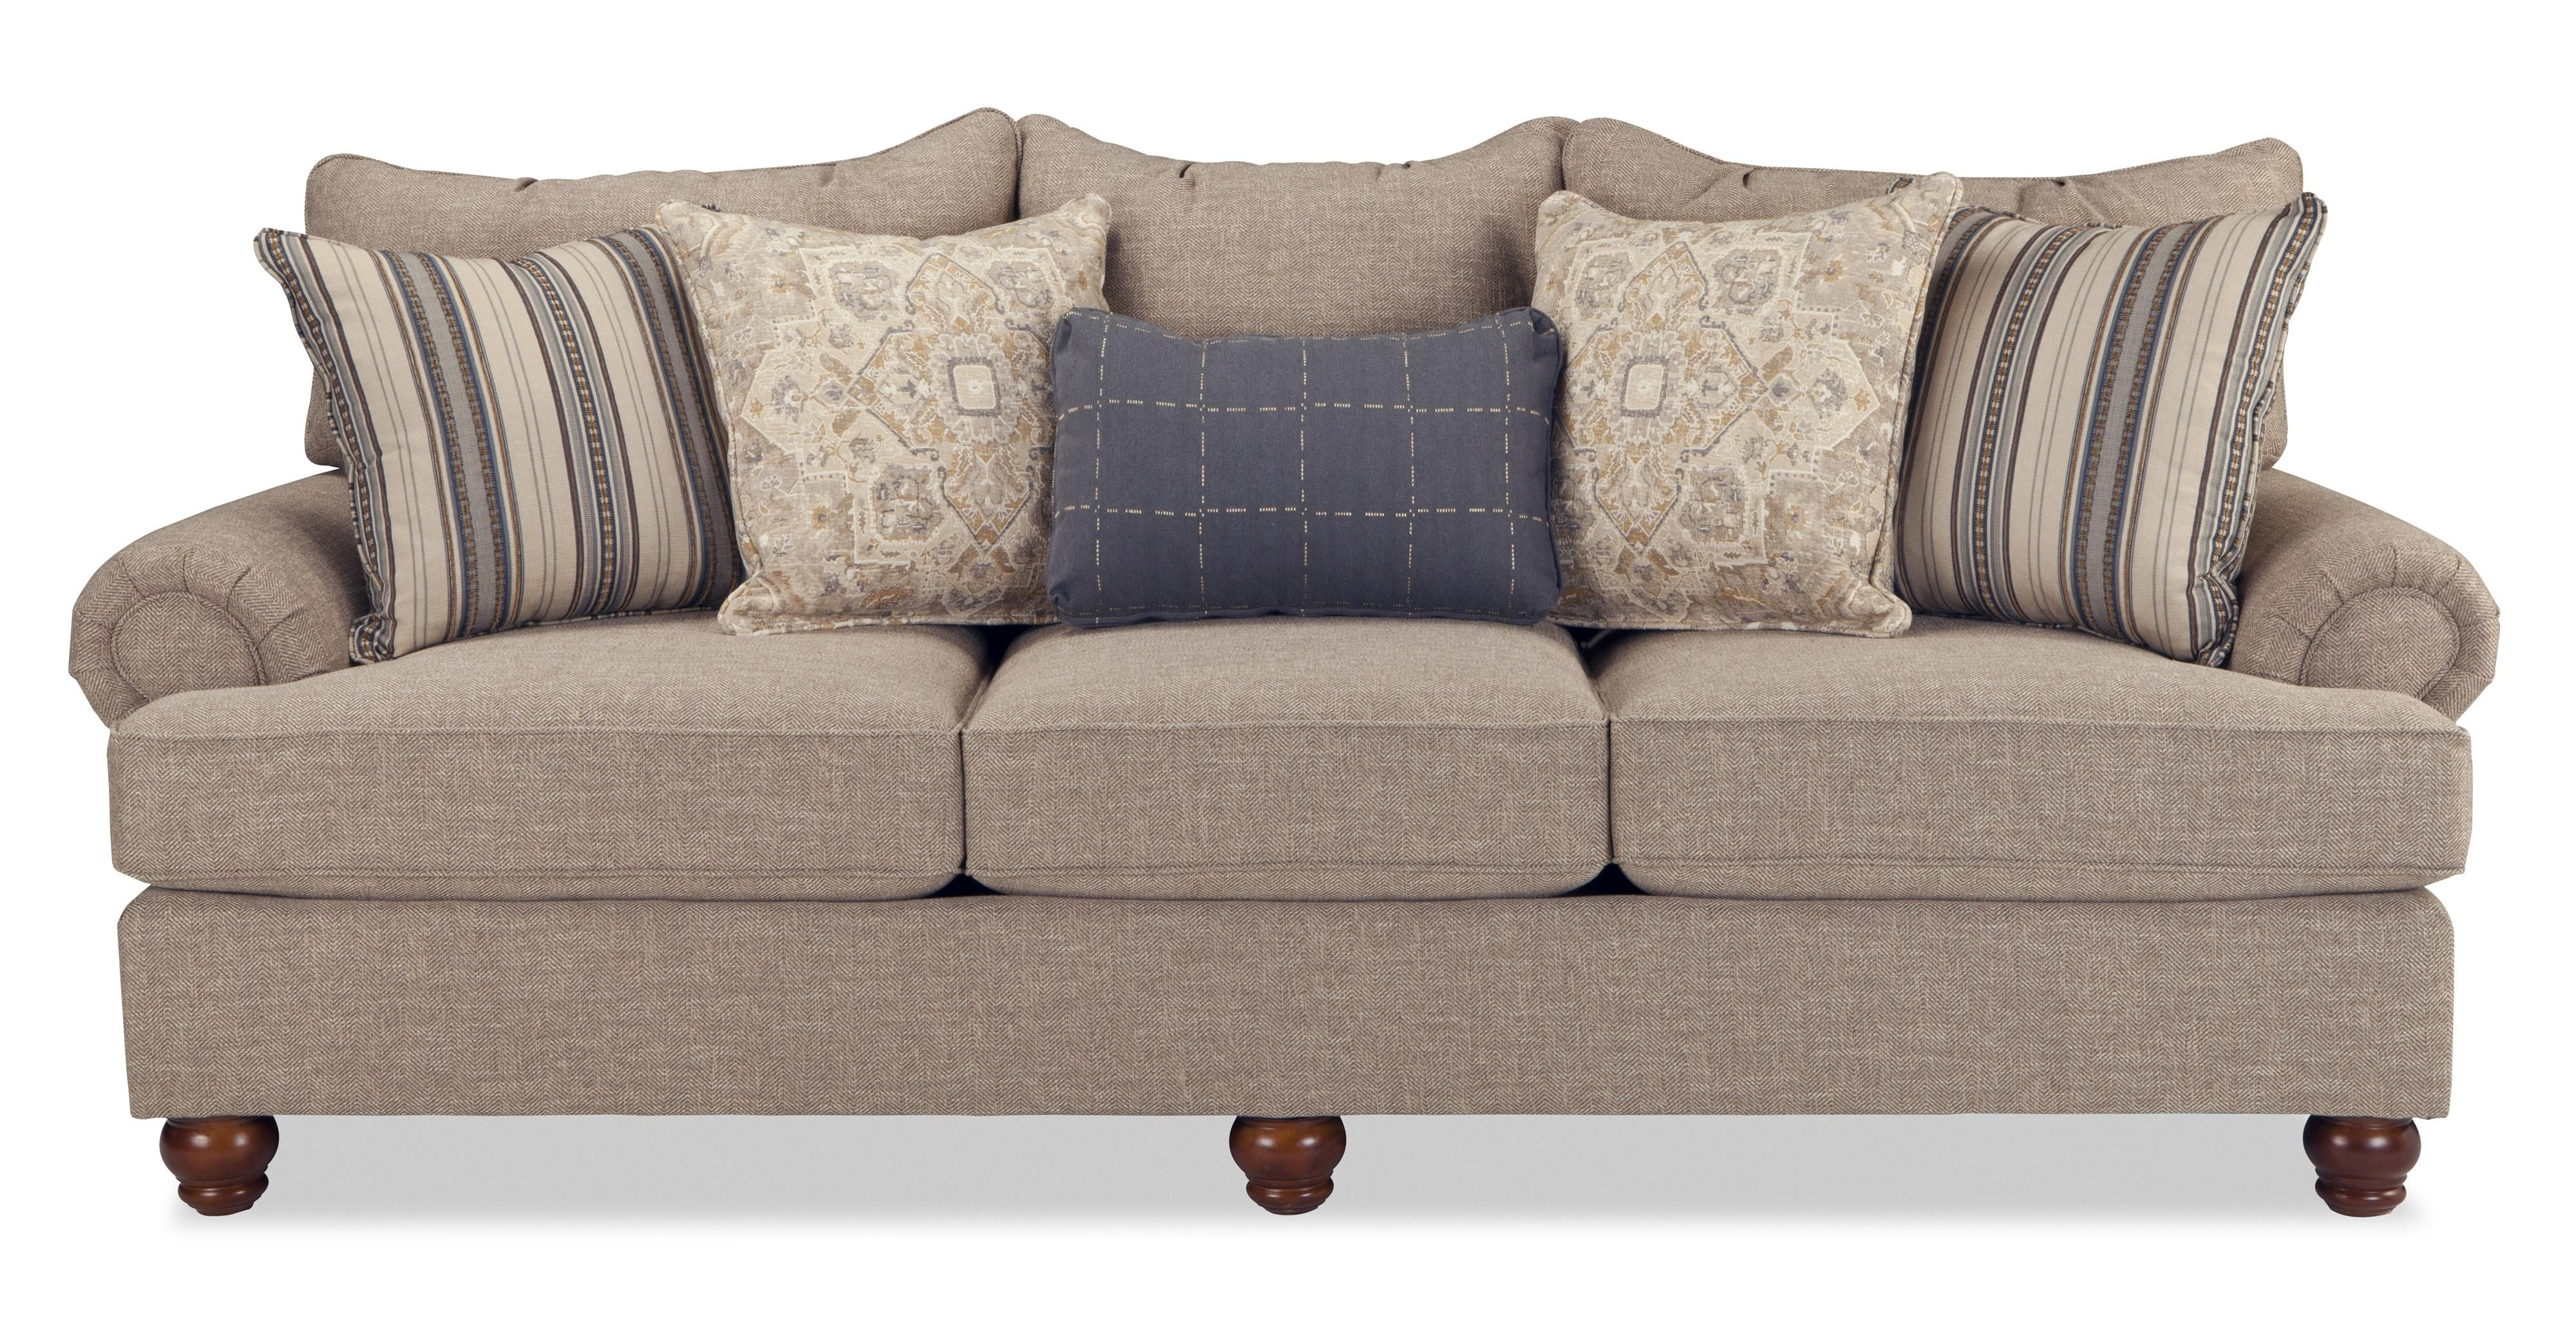 Craftmaster Carla Sofa Item Number 797050pc Tolliver 10 Traditional Sofa Craftmaster Furniture Mattress Furniture